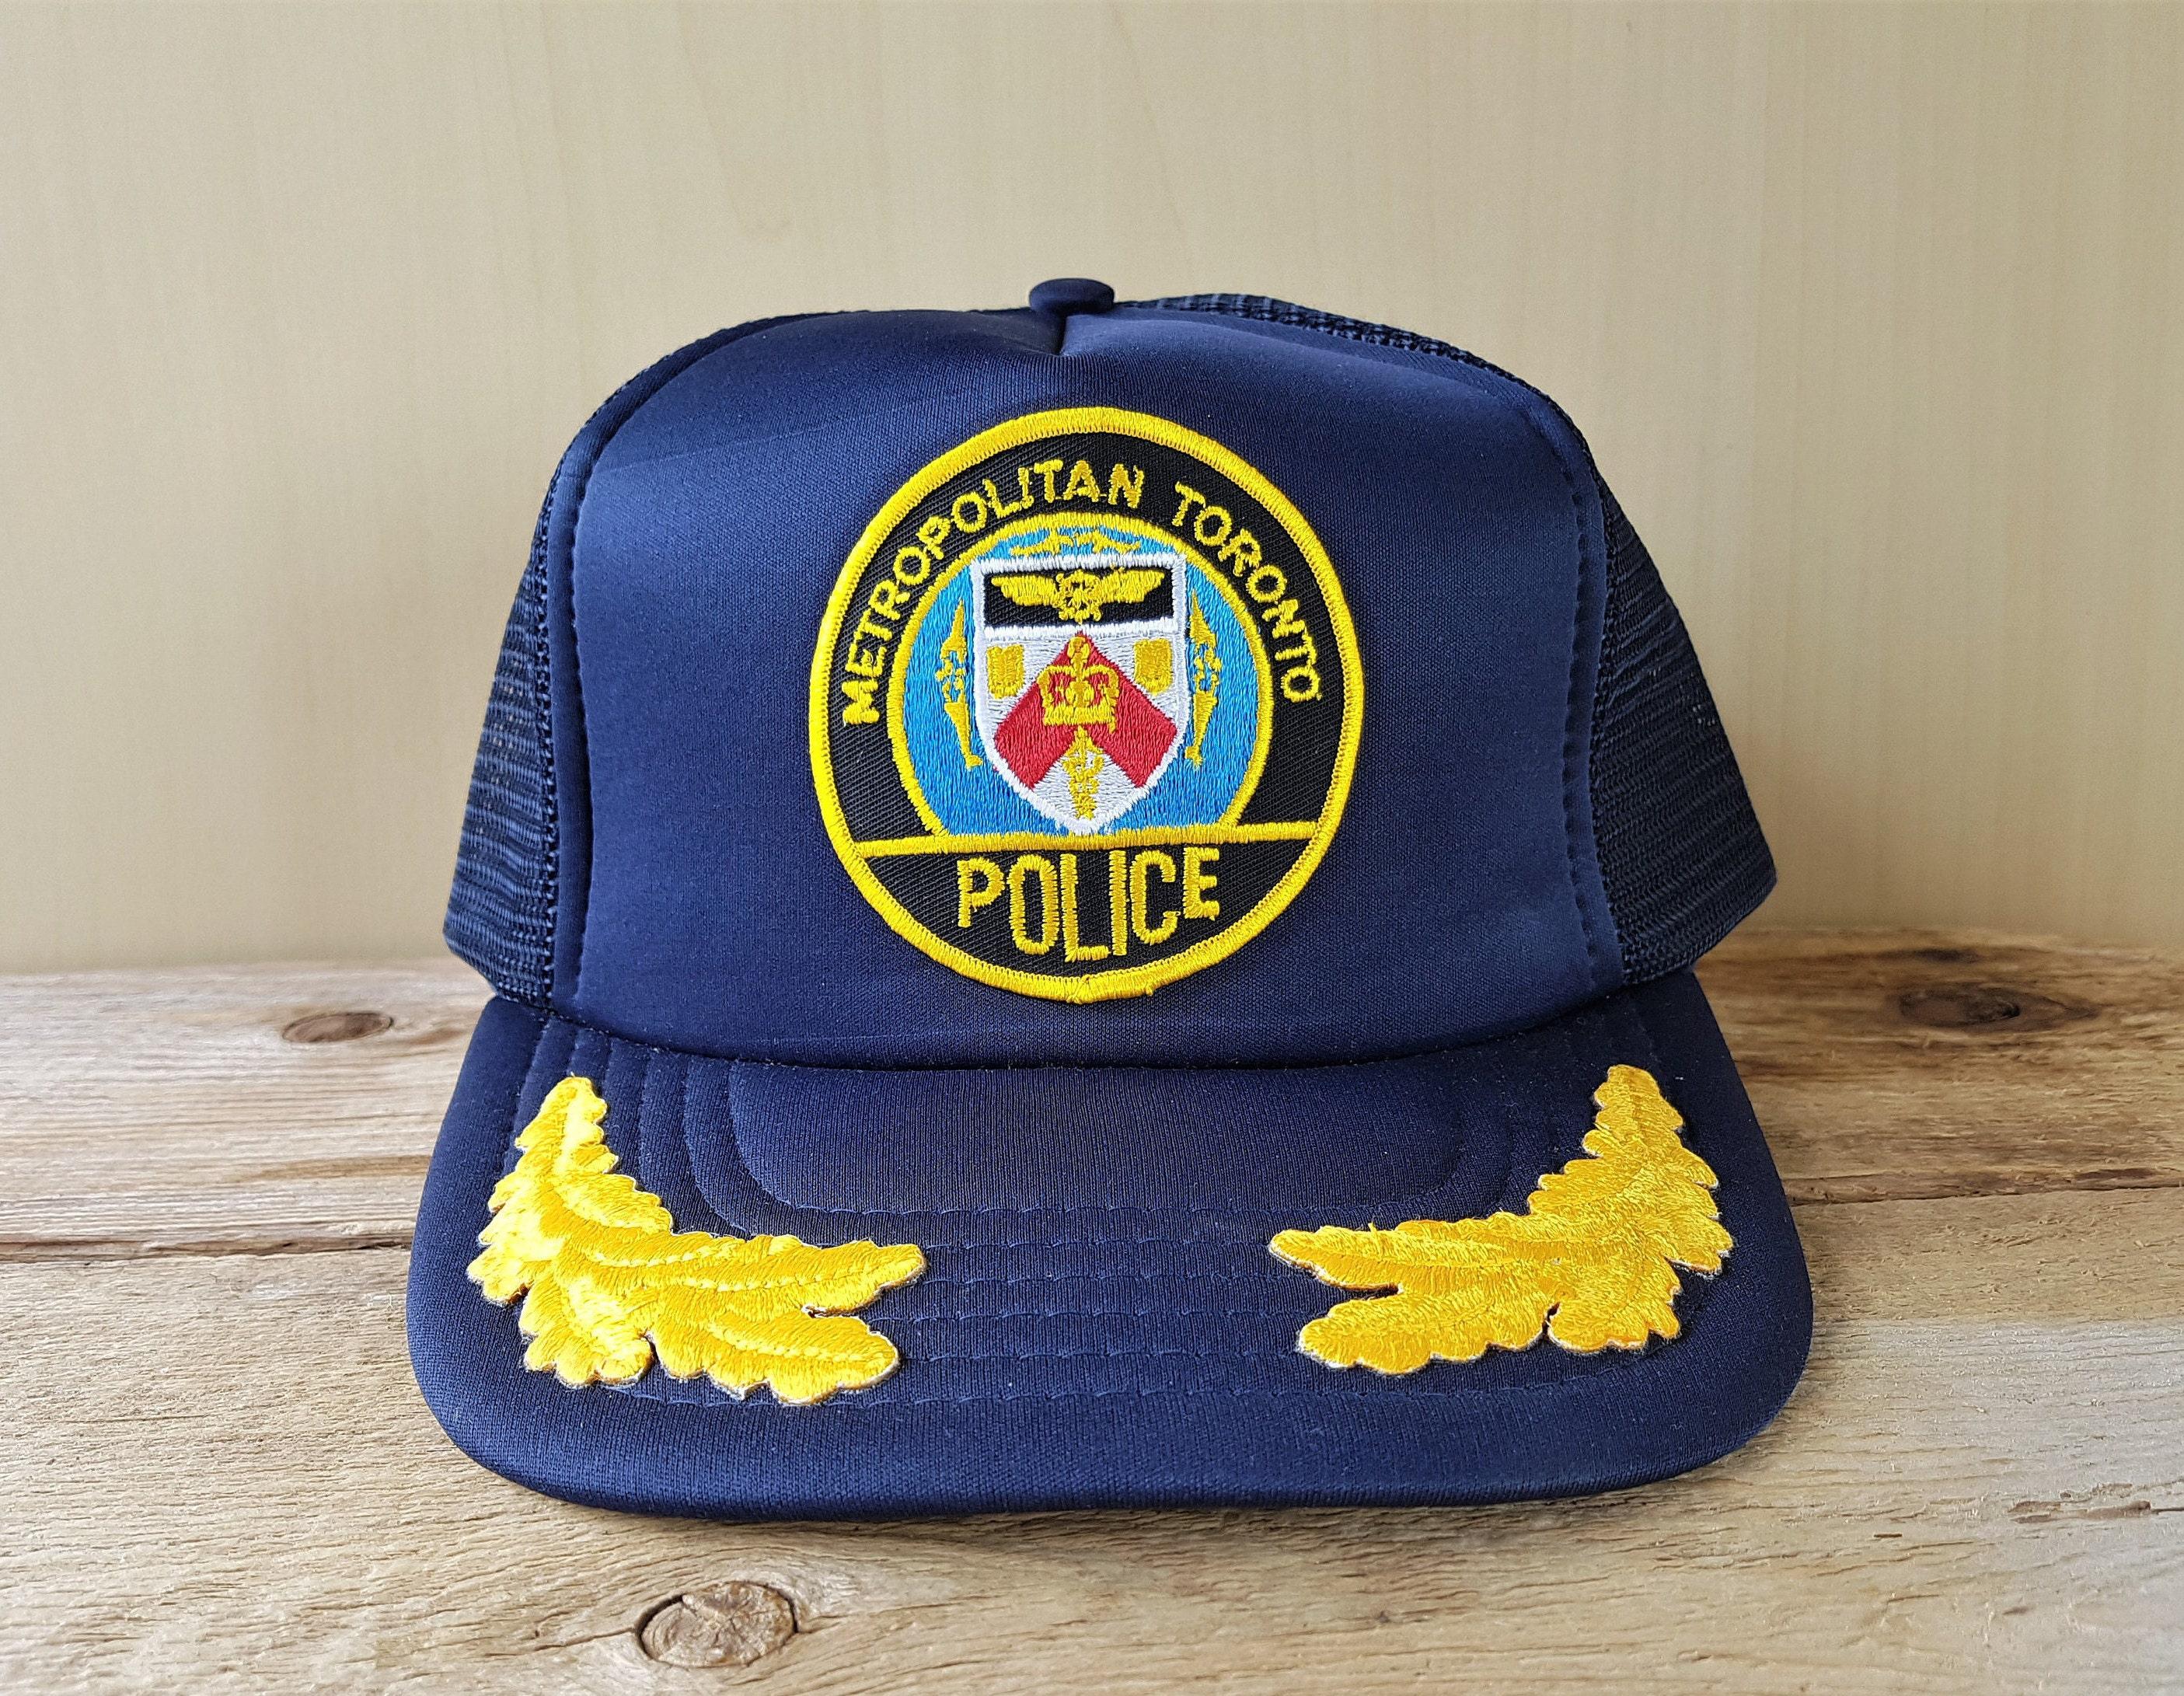 d109a39b8 Metropolitan Toronto Police Original Vintage 80s Navy Mesh Trucker Snapback  Hat Captain Adjustable Cap Golden Laurel To Serve And Protect